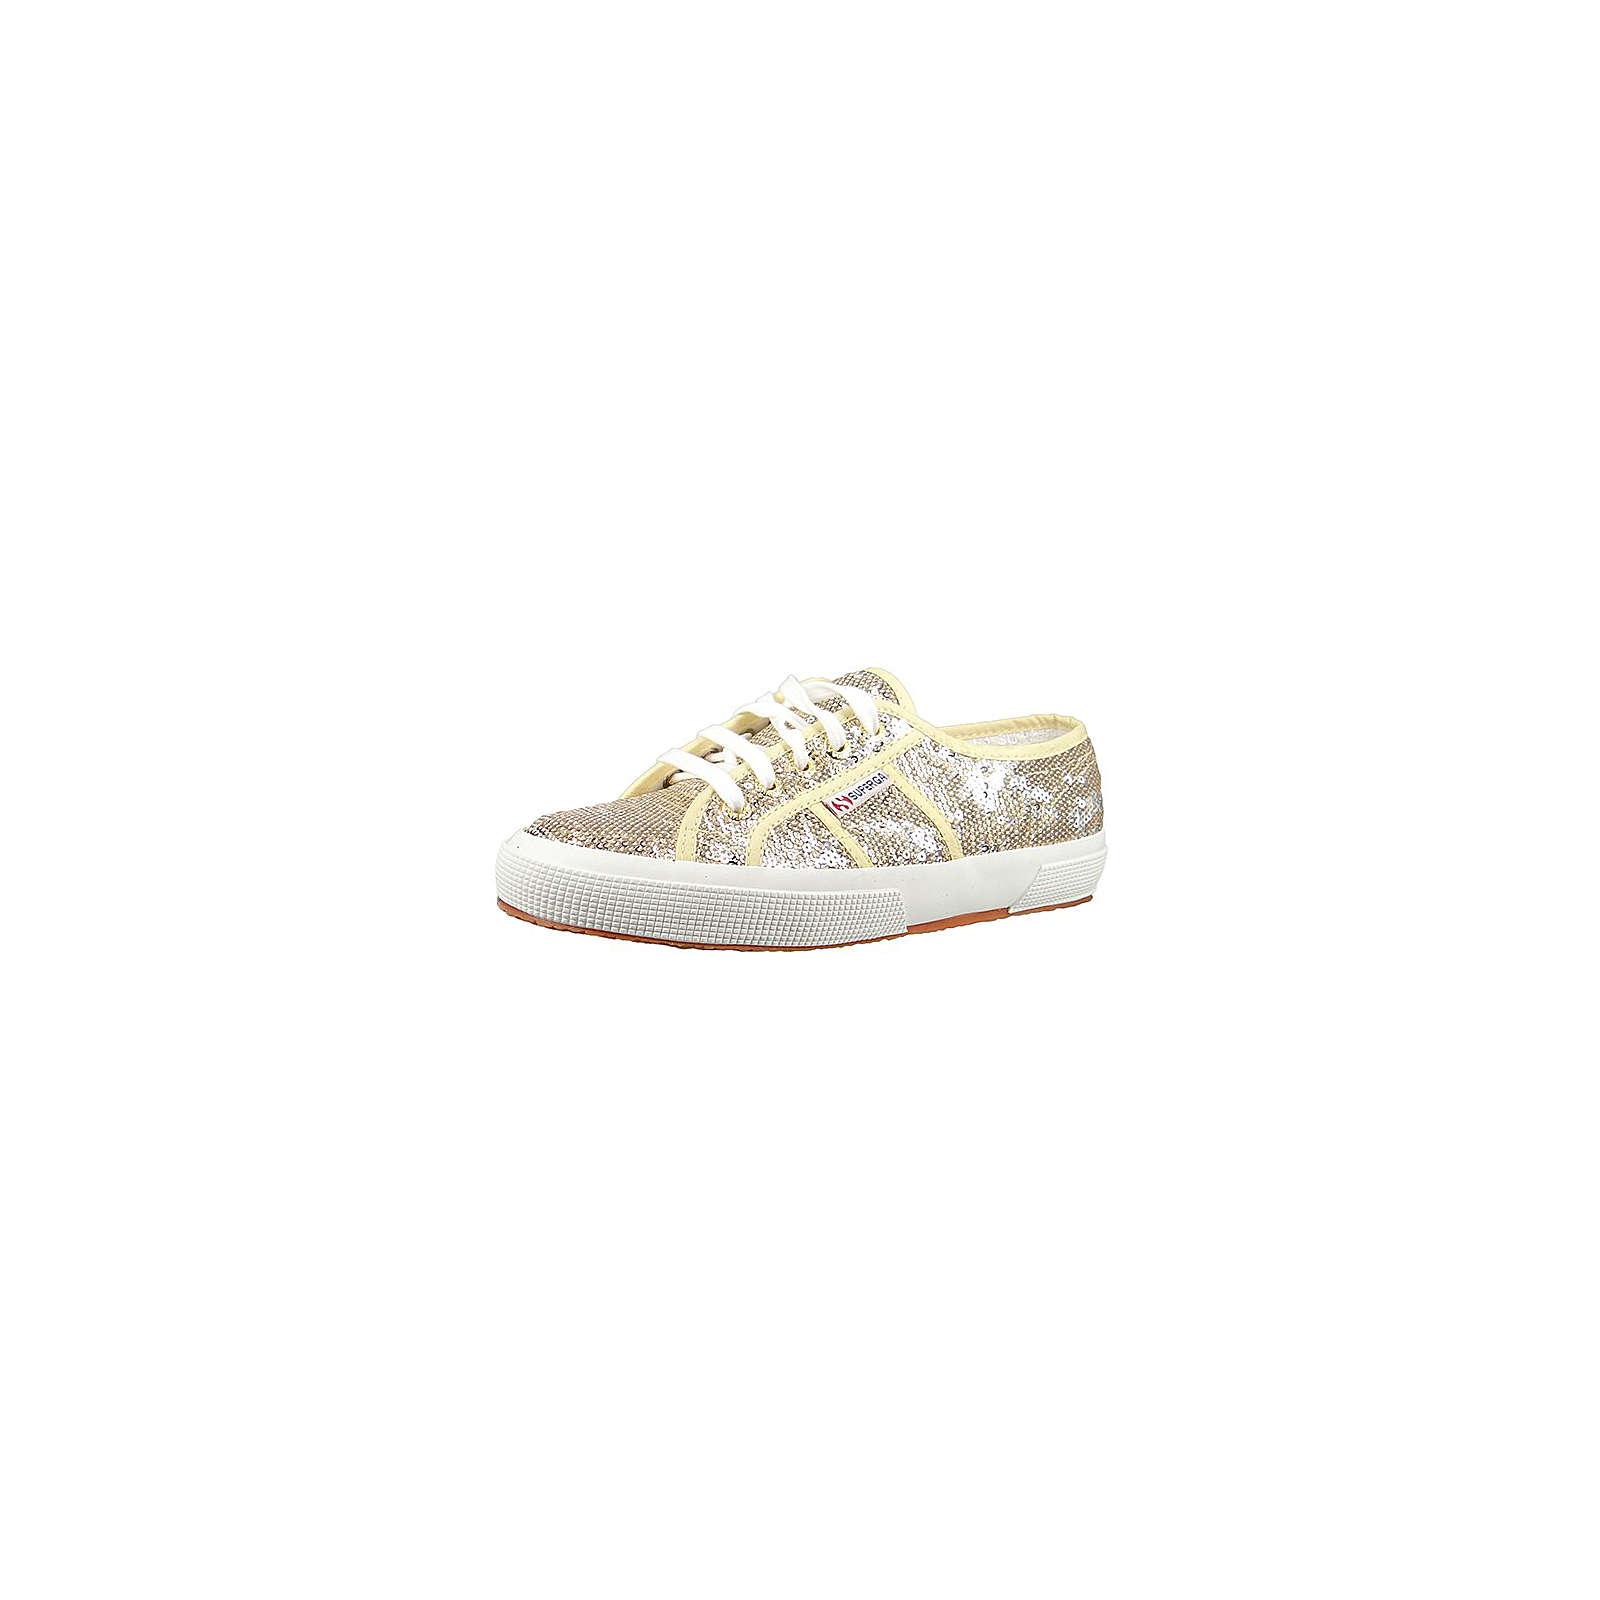 Superga® Sneaker Low gold Damen Gr. 37